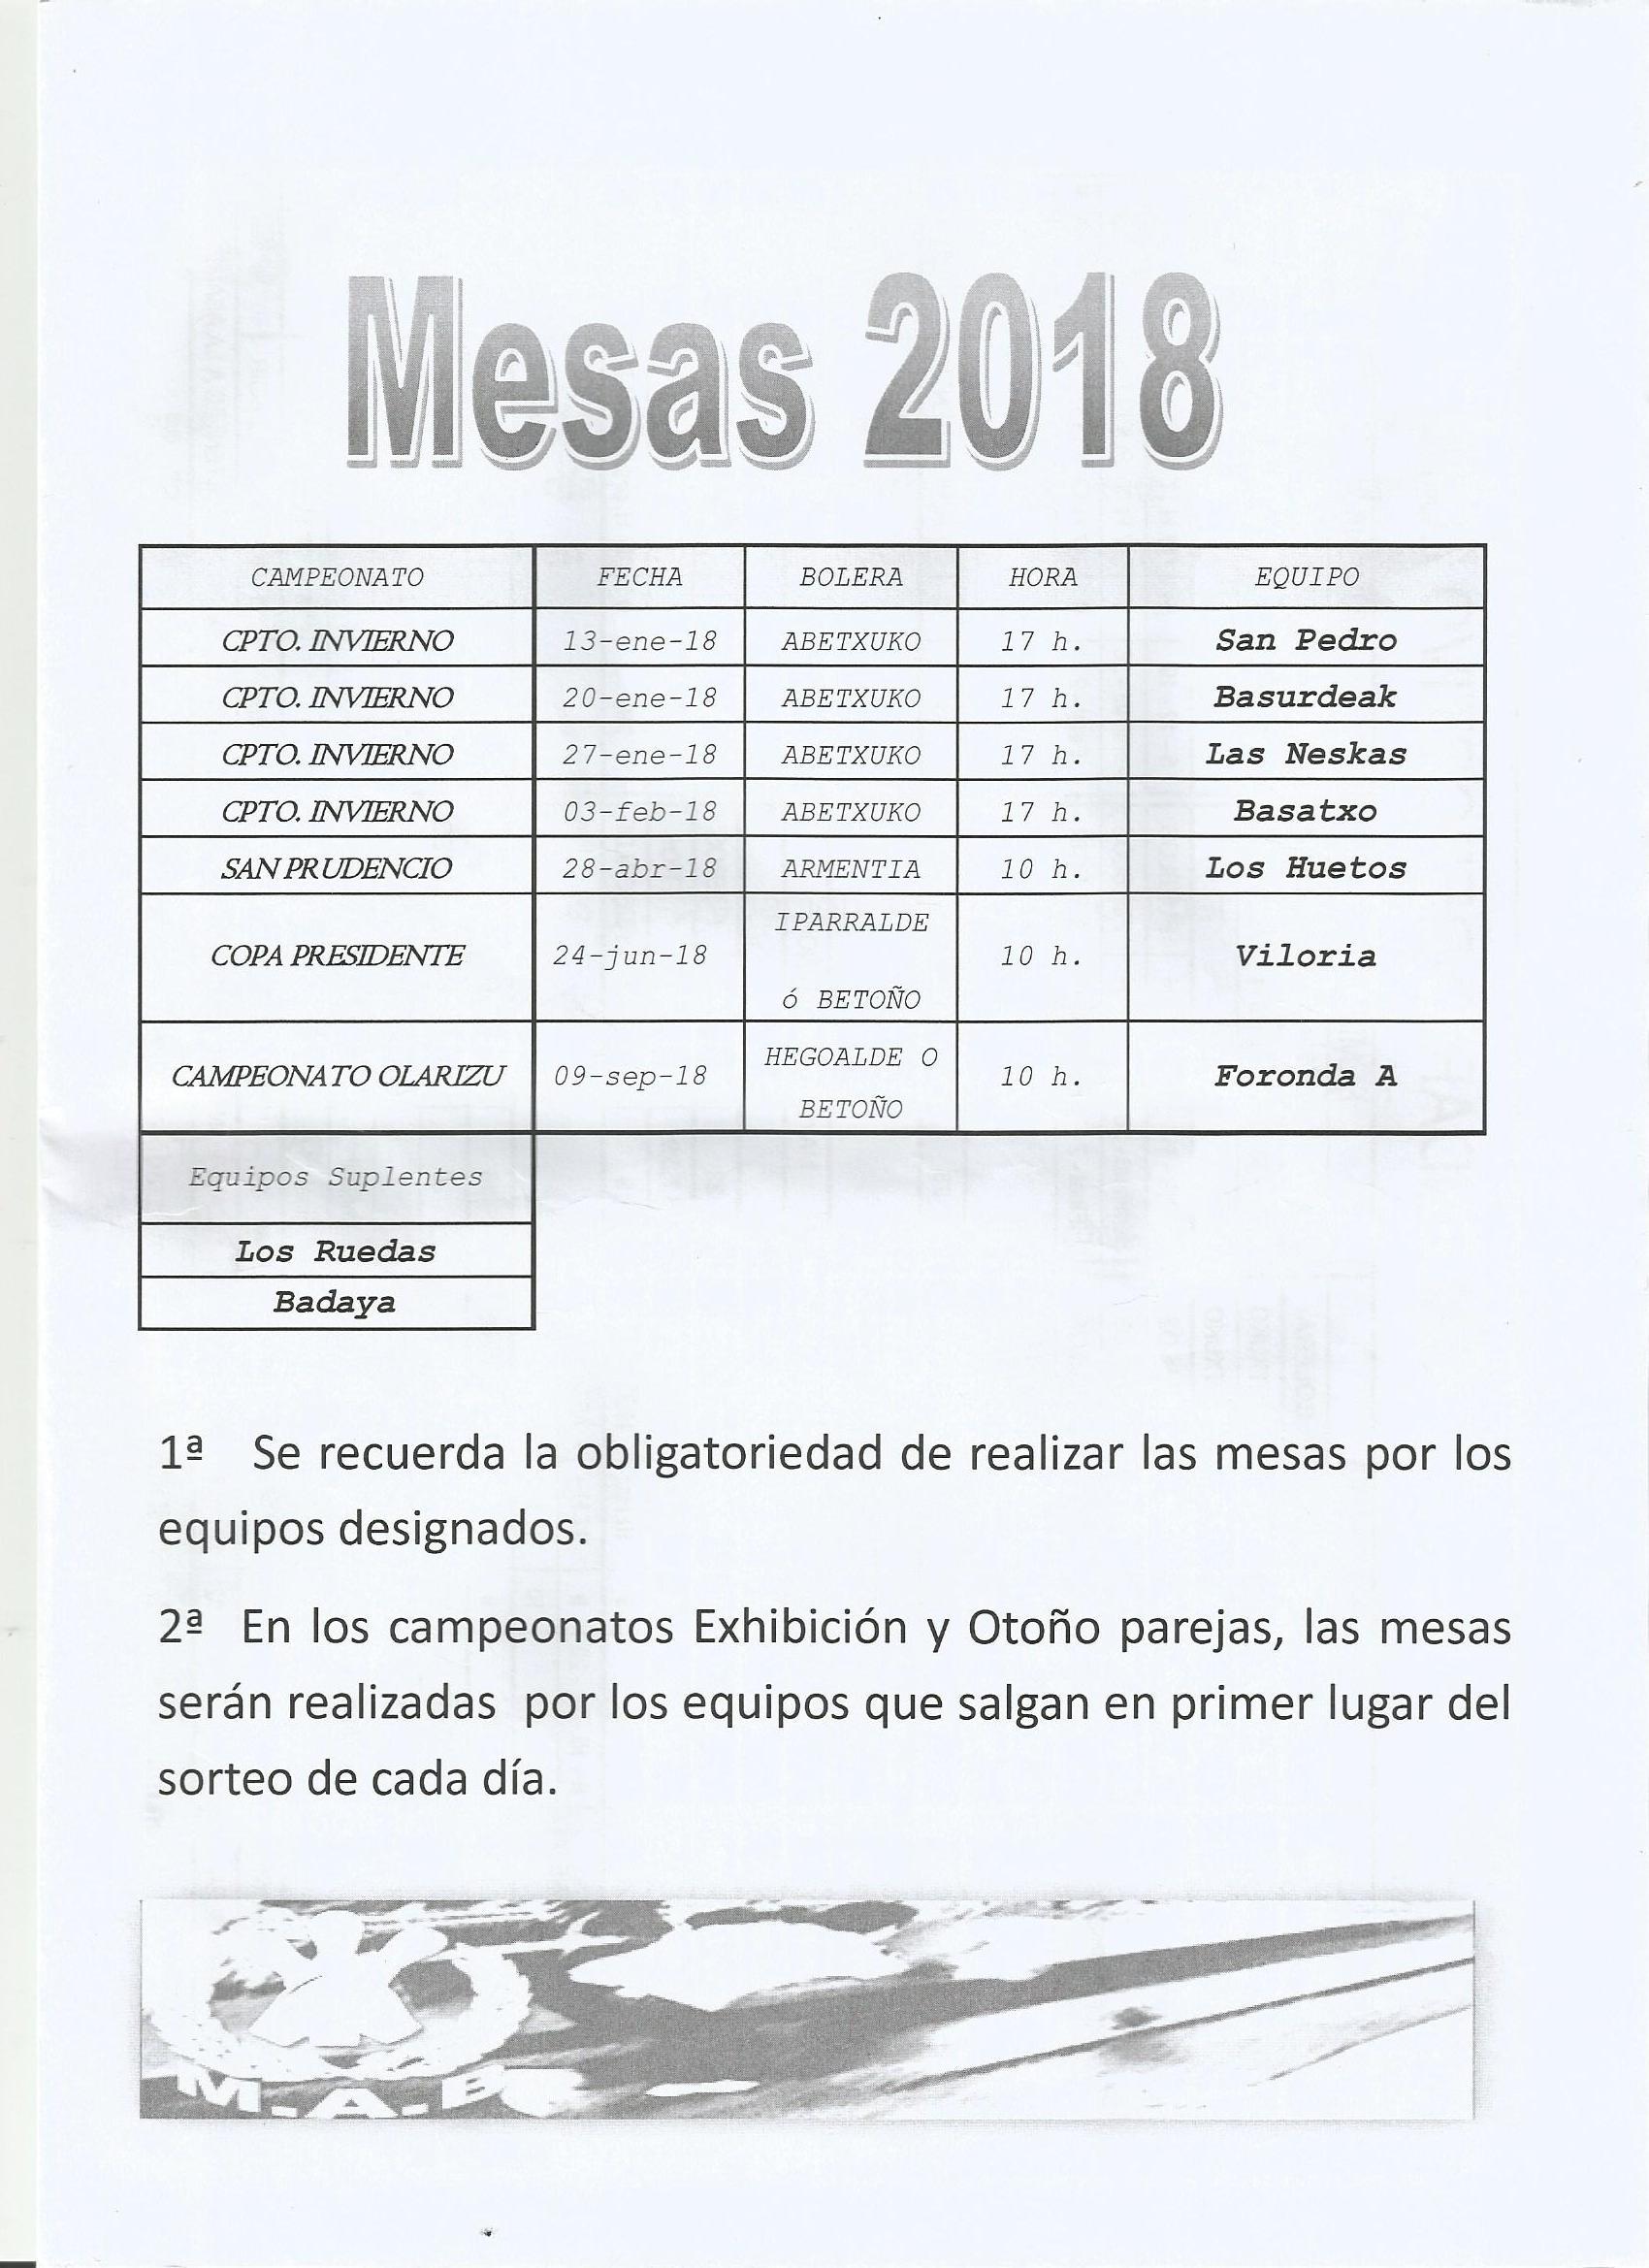 MESAS 2018